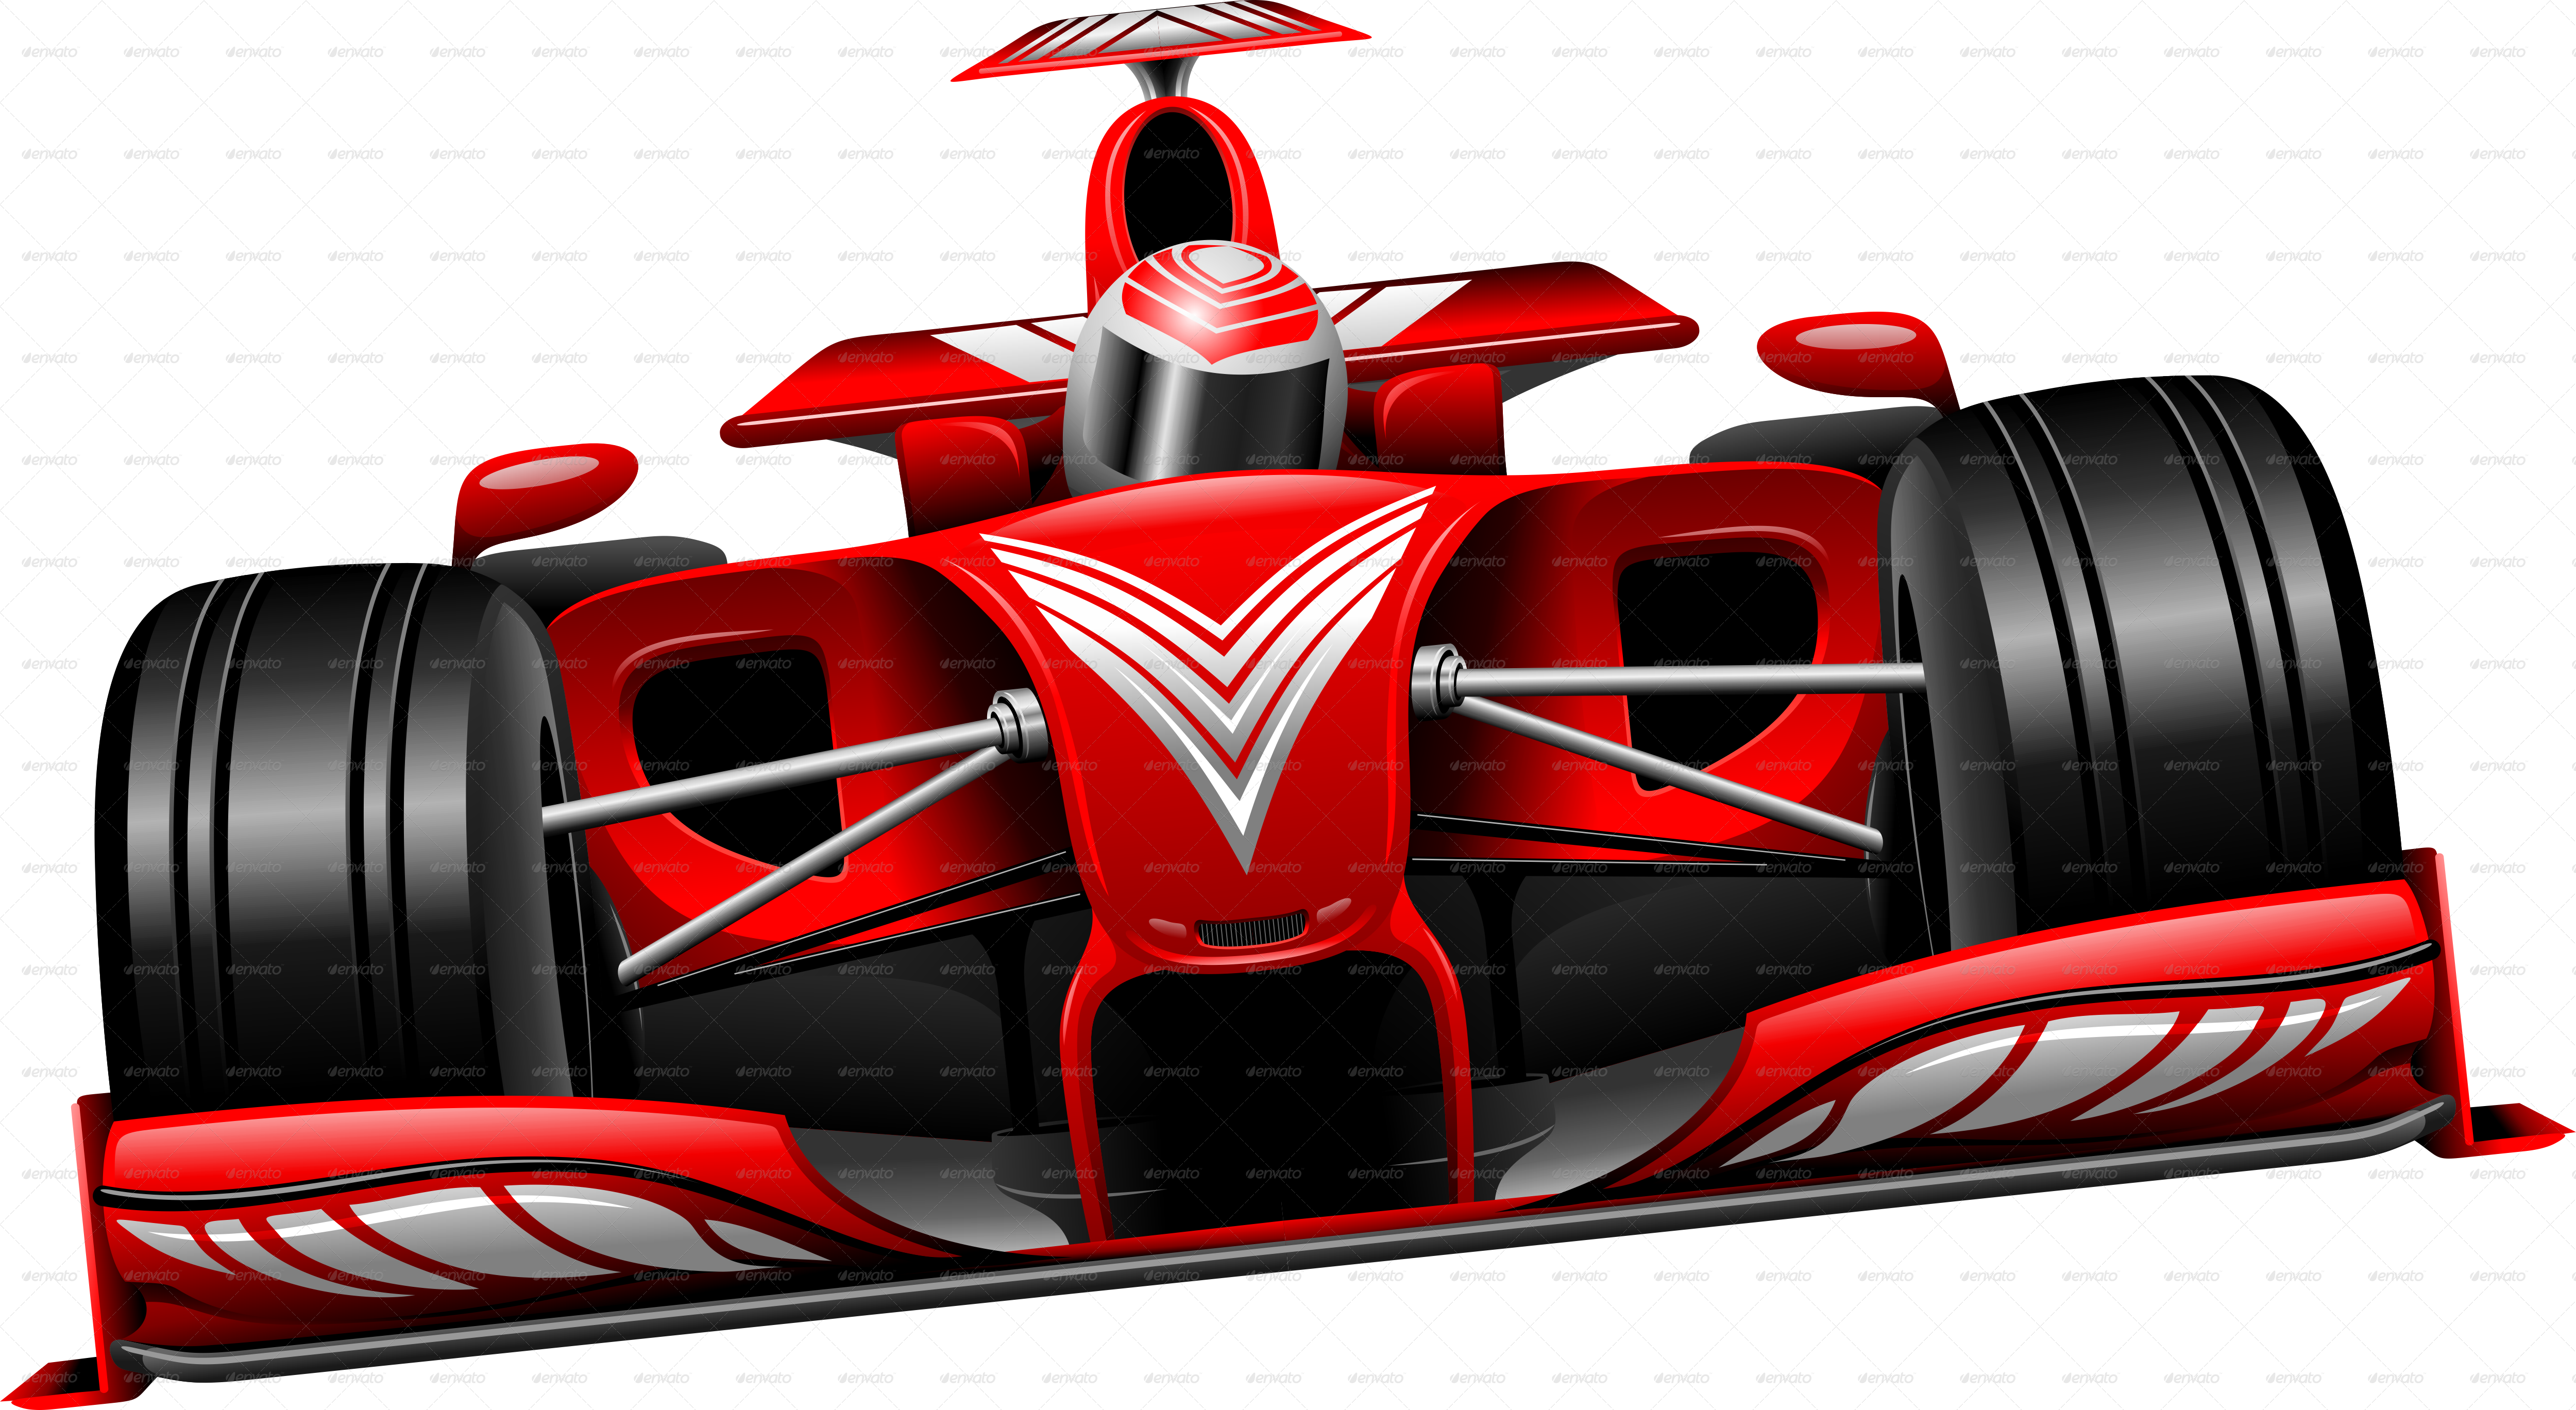 Race car flag clipart image stock Formula 1 Red Race Car GP Brazil | Themestack.net image stock